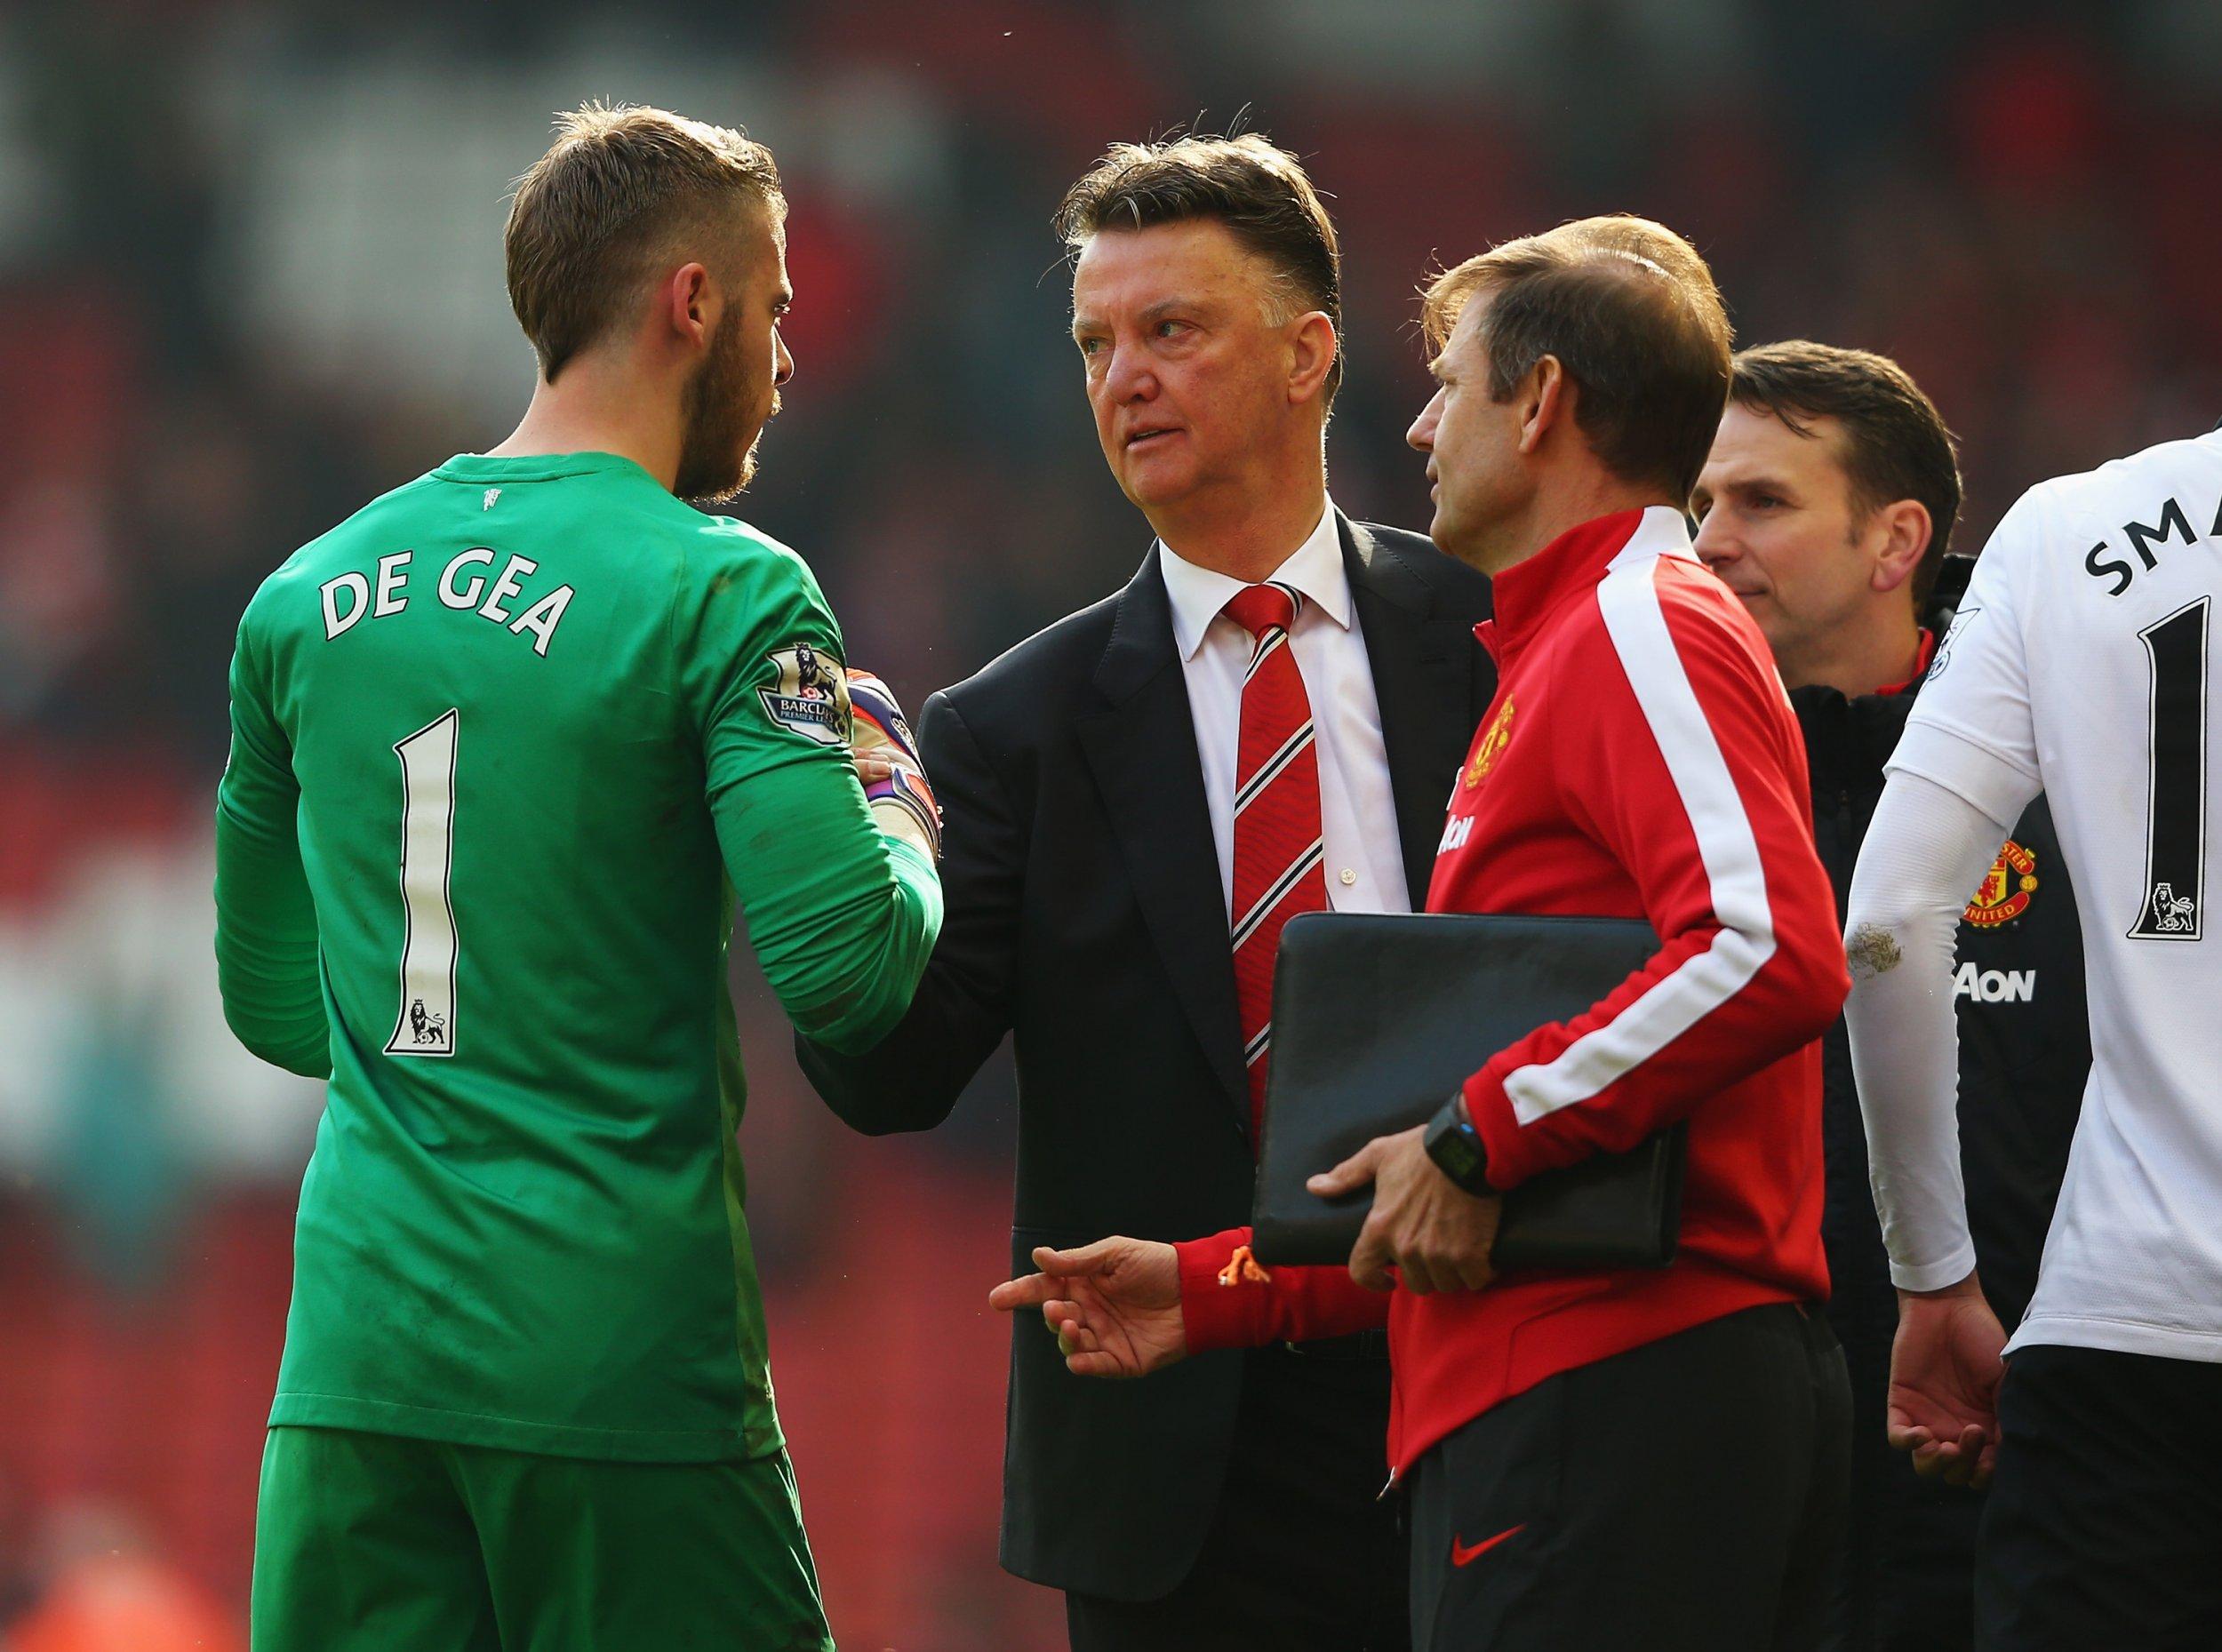 Manchester United goalkeeper David De Gea, left, and manager Louis Van Gaal, centre.